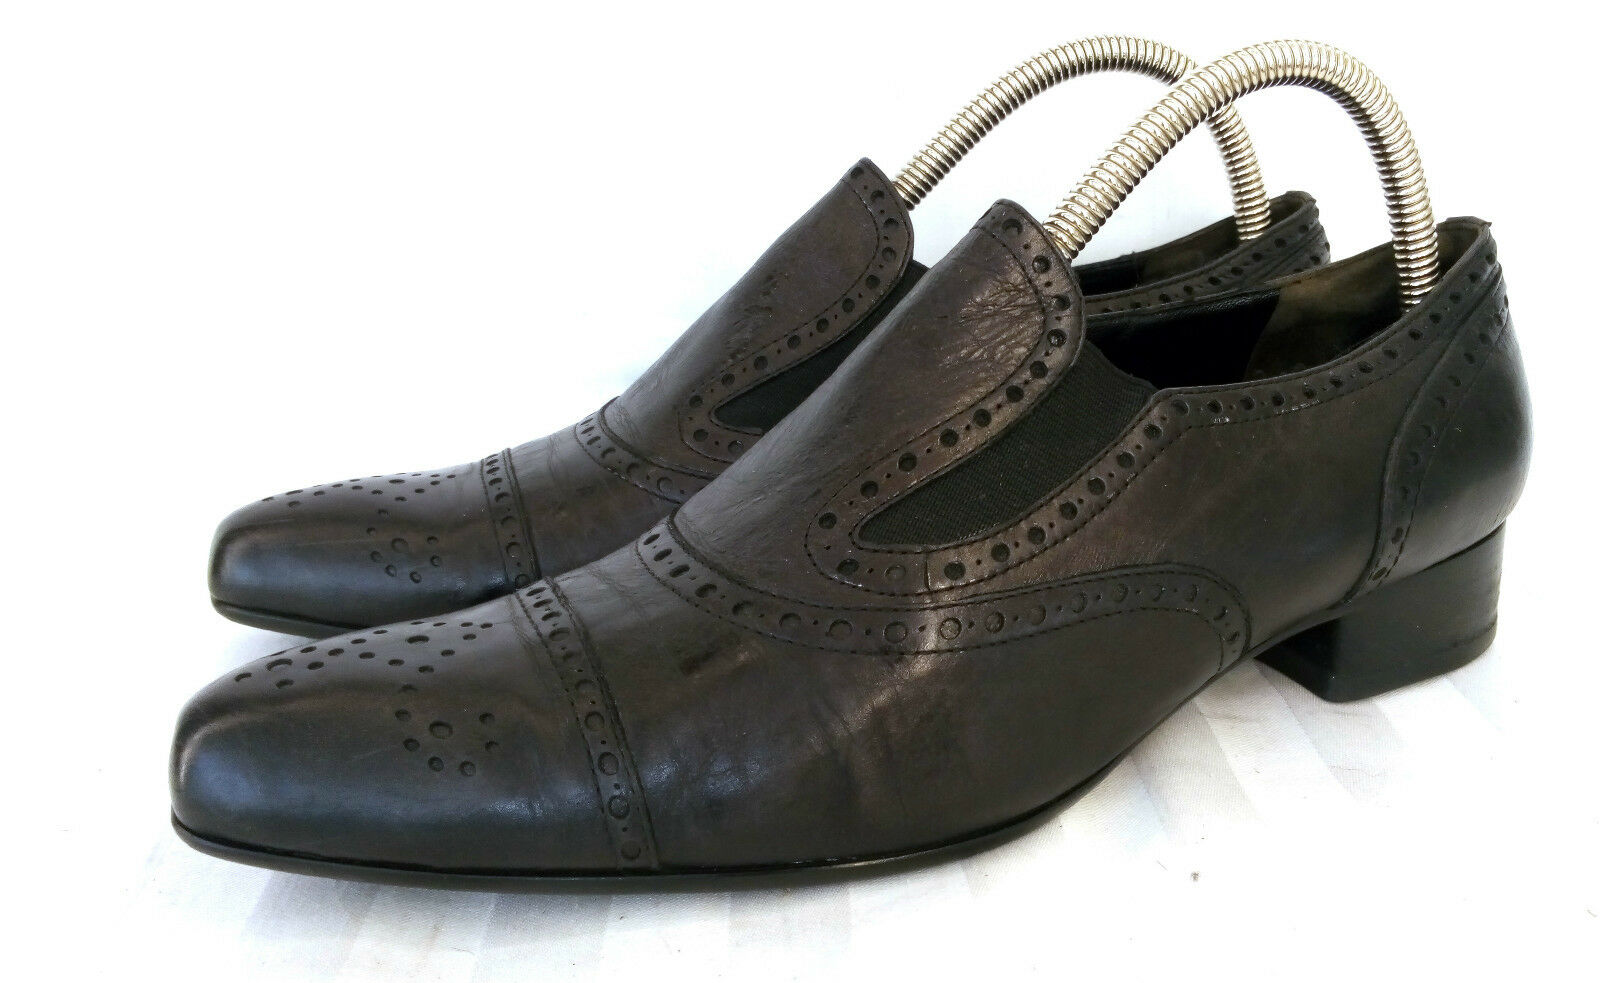 Kennel und Schmenger Brogue Loafer Slipper Damenschuhe Schwarz Leder UK 6 Gr. 39